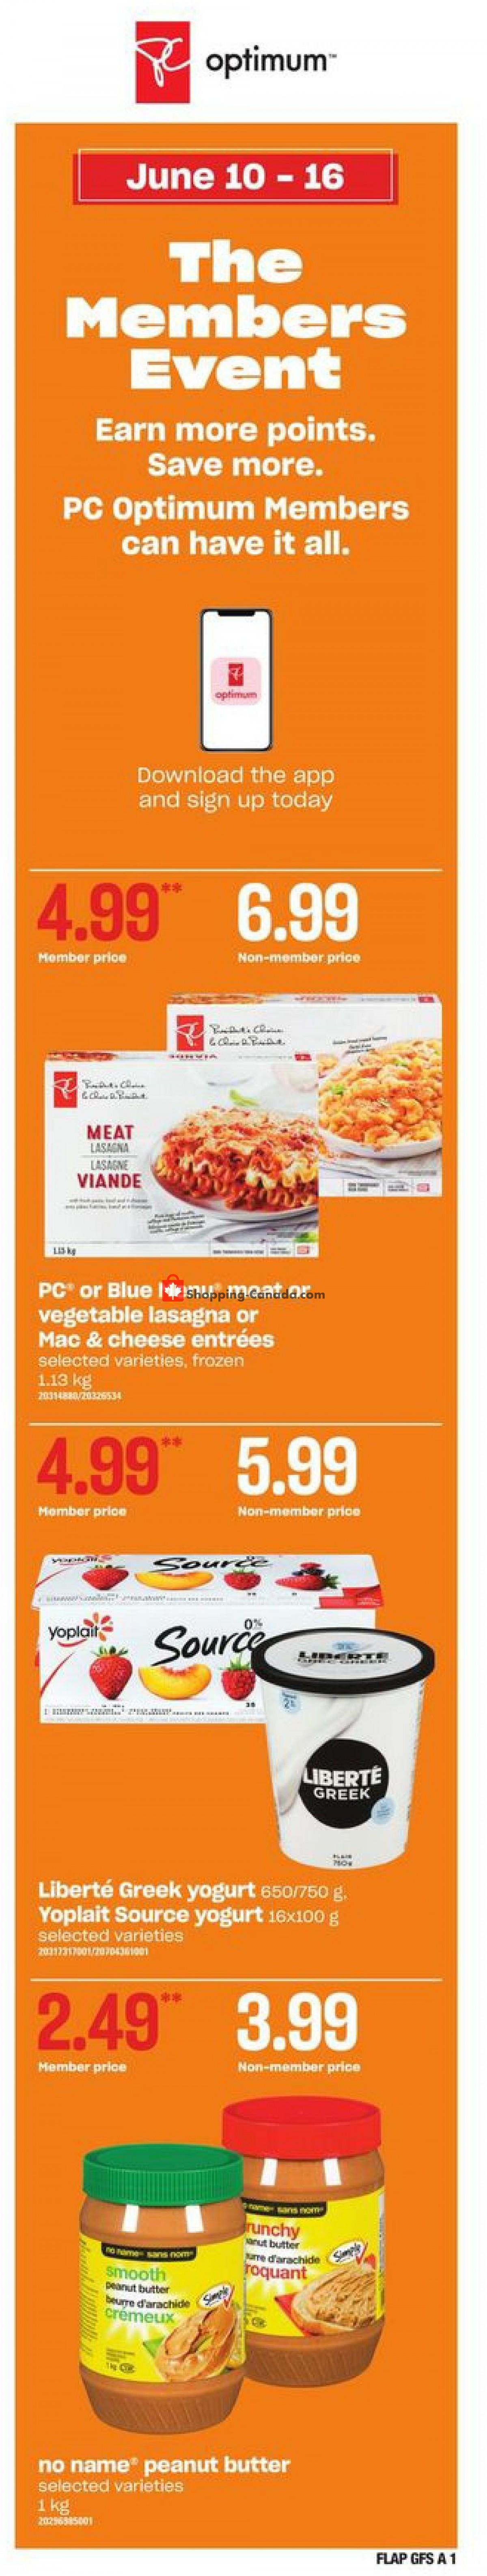 Flyer Valu Mart Canada - from Thursday June 10, 2021 to Wednesday June 16, 2021